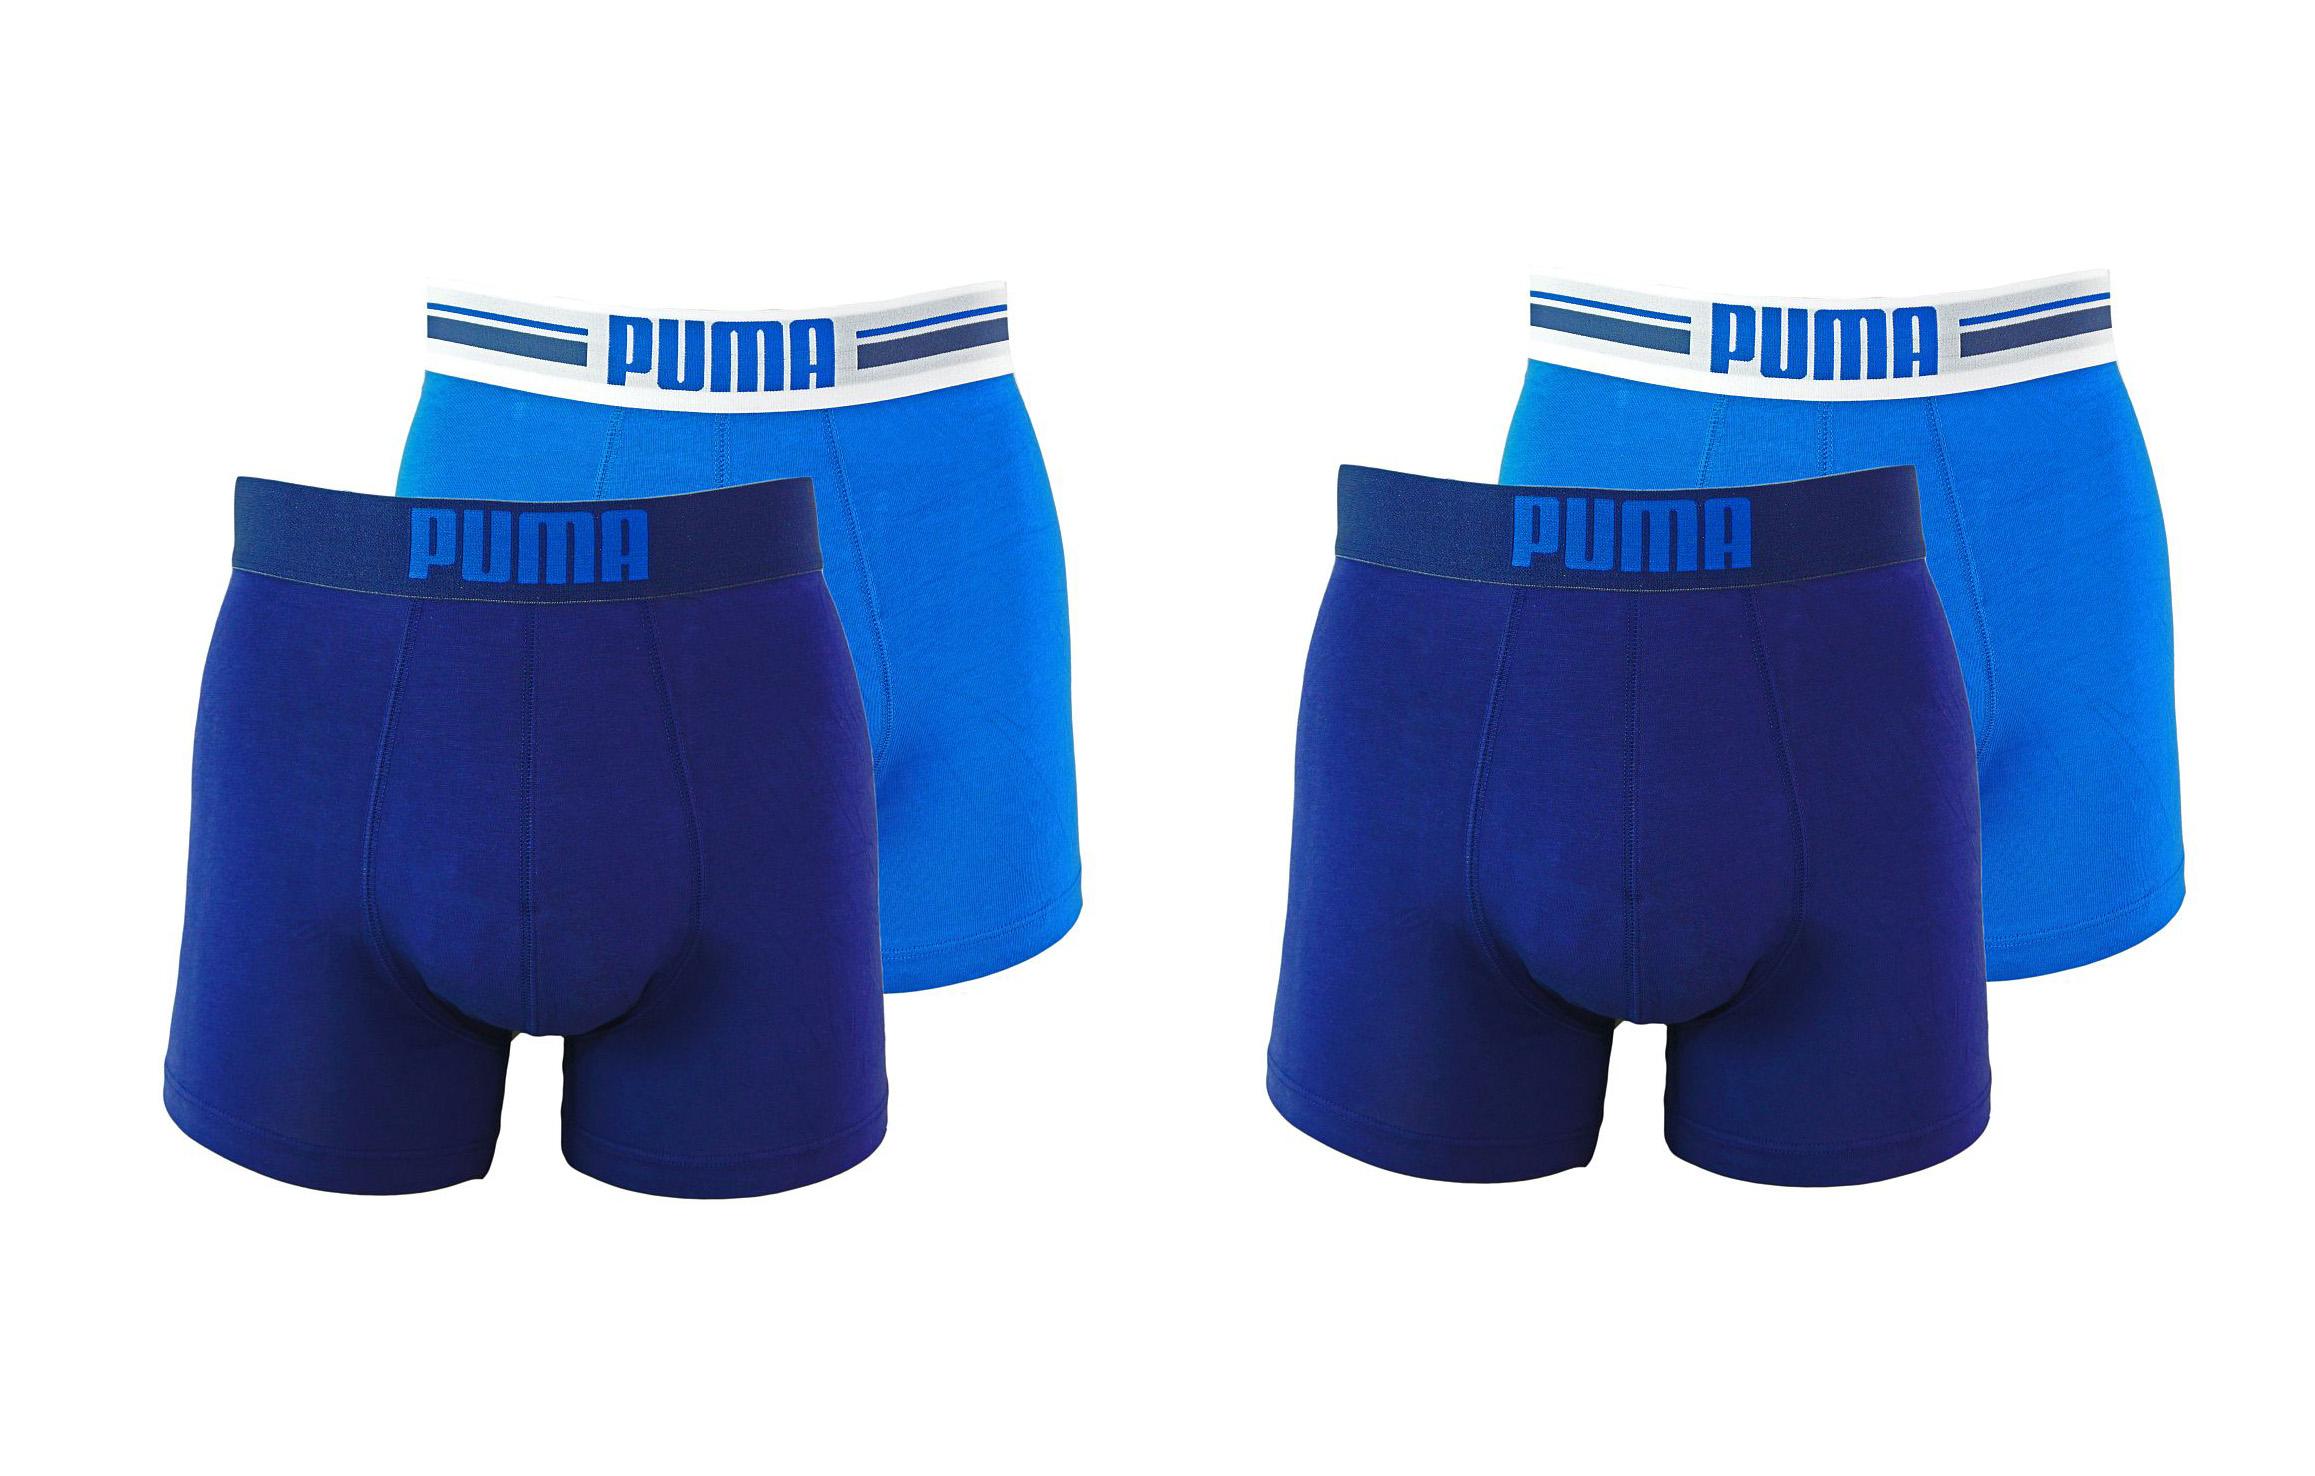 PUMA Shorts Unterhosen 2 x 2er Pack Boxer 651003001 056 020 blue SF17-PMS2